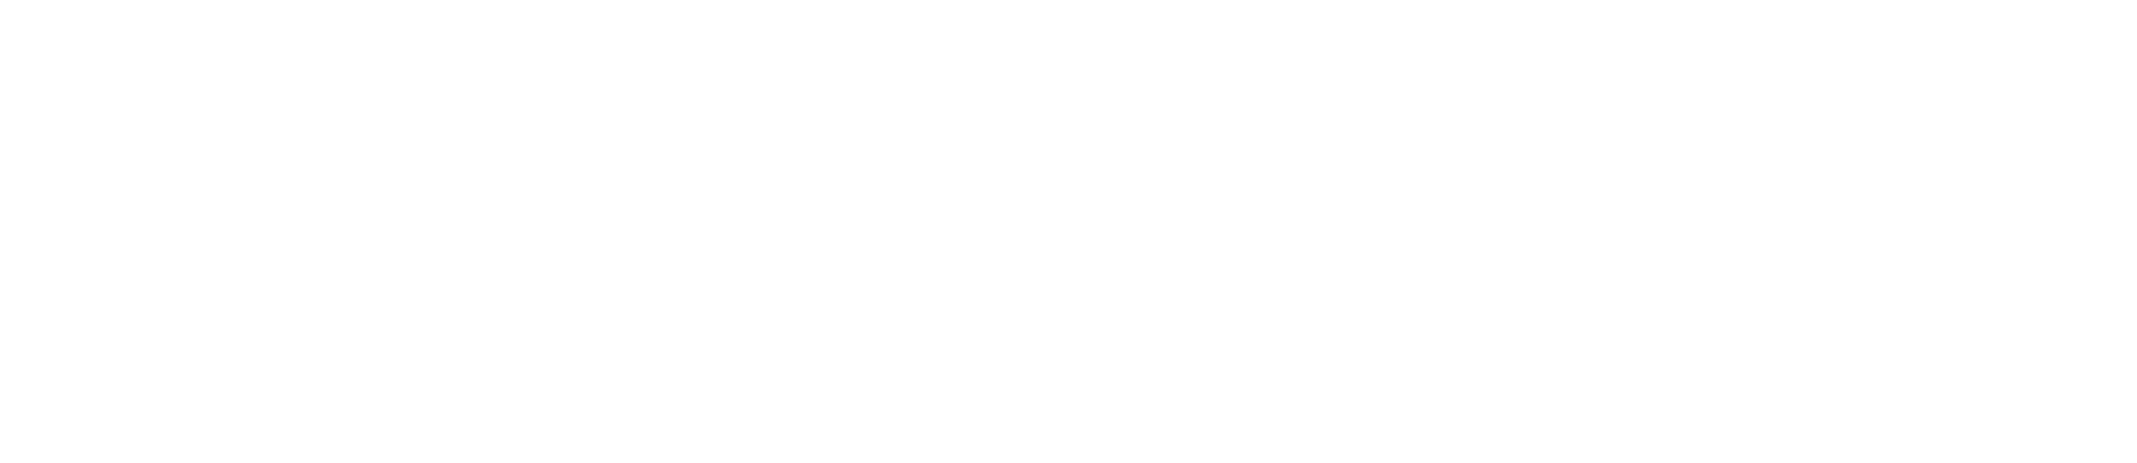 3YB FM White